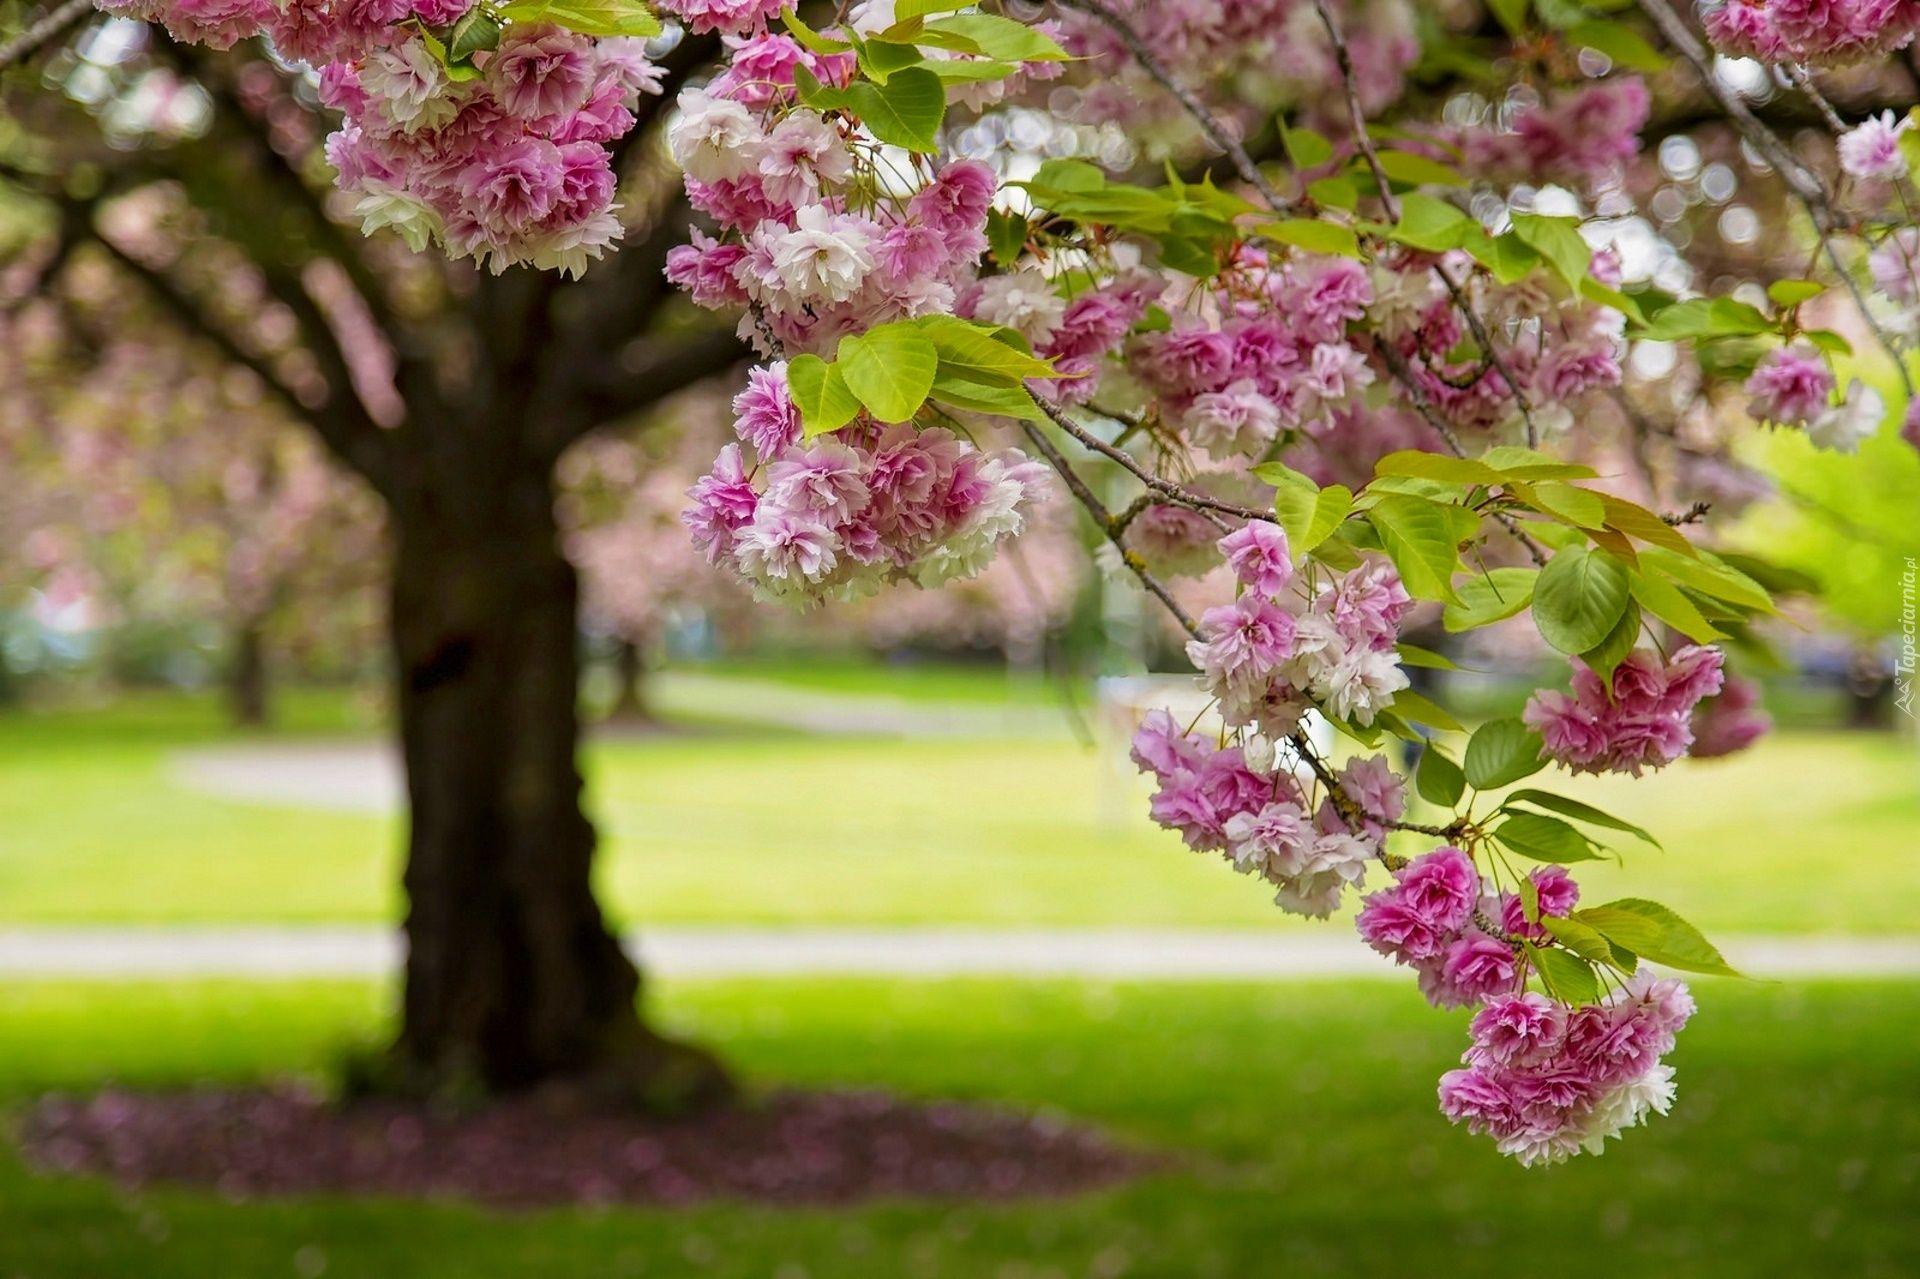 Wiosna Flowers Wallpaper Plants